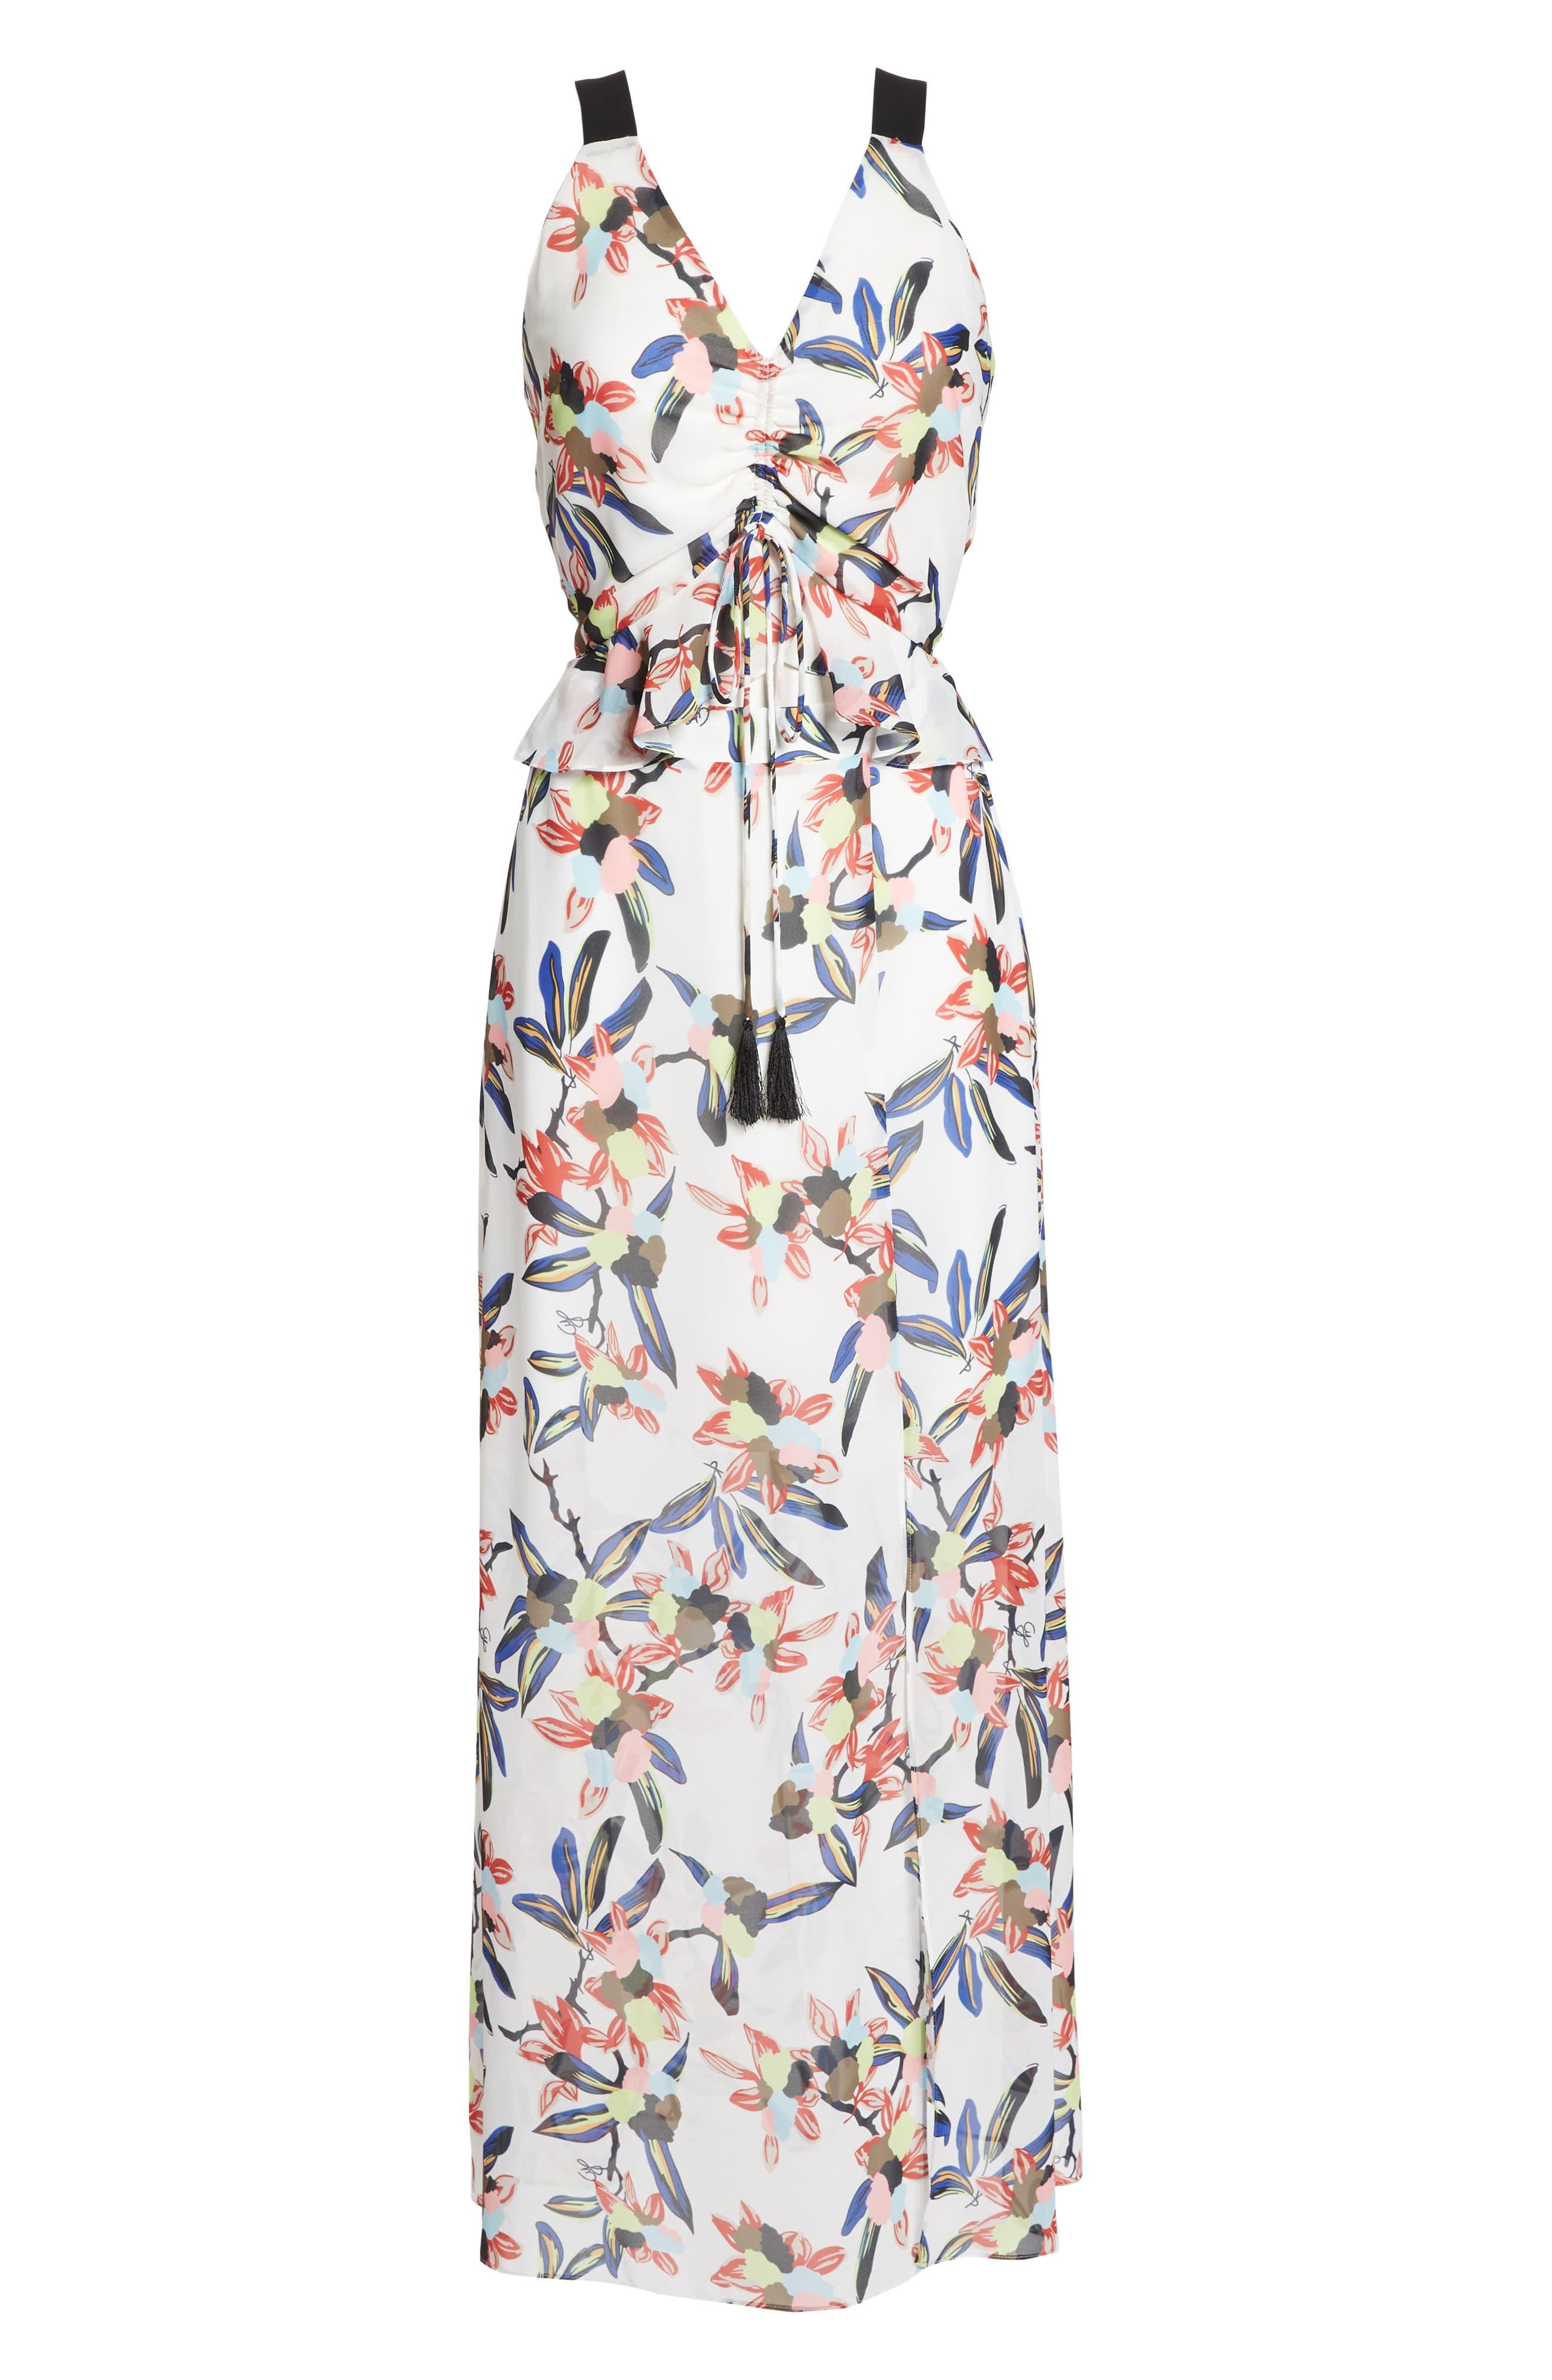 Floral Print Maxi Dress,                             Alternate thumbnail 7, color,                             165